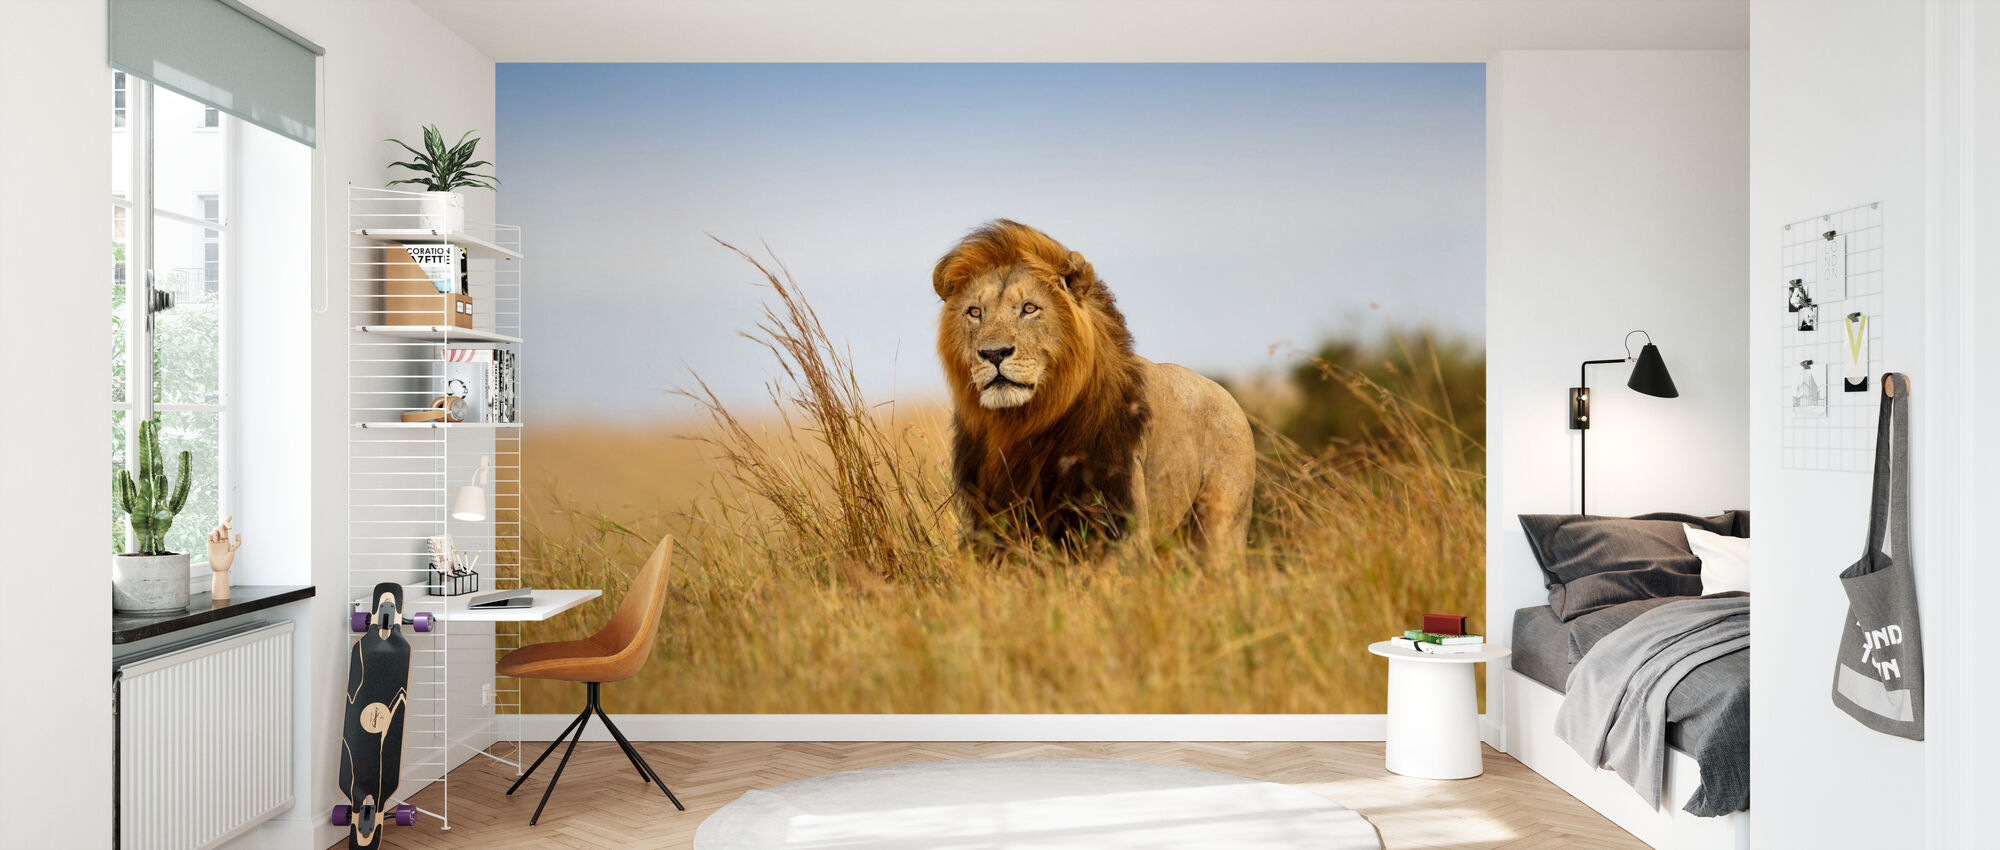 Løve i det gylne gresset - Tapet - Barnerom